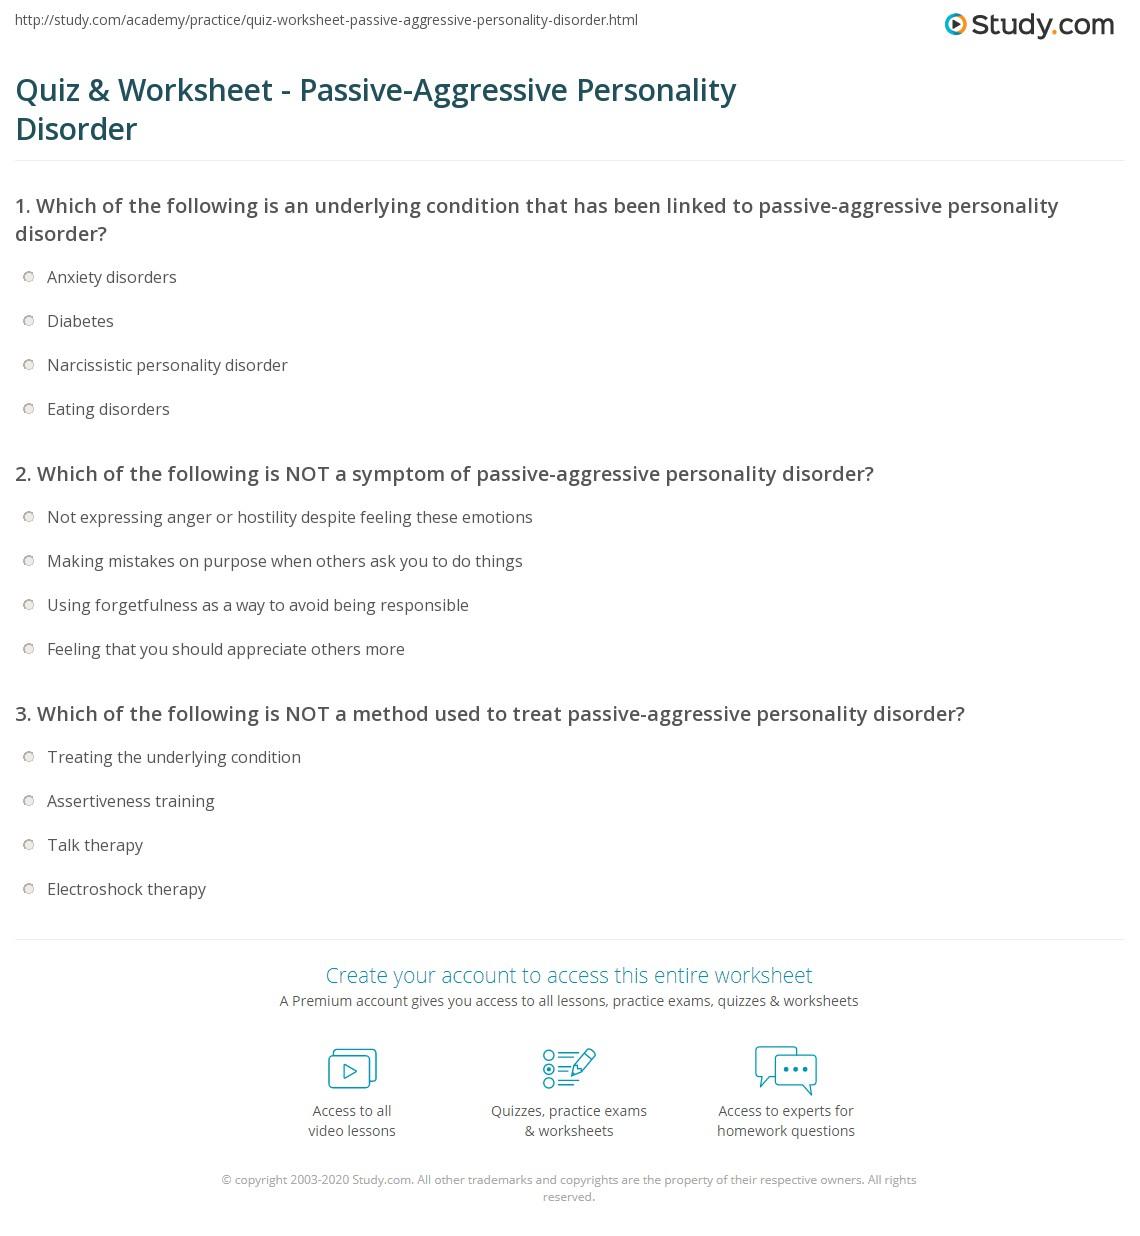 Quiz Worksheet Passive Aggressive Personality Disorder Study